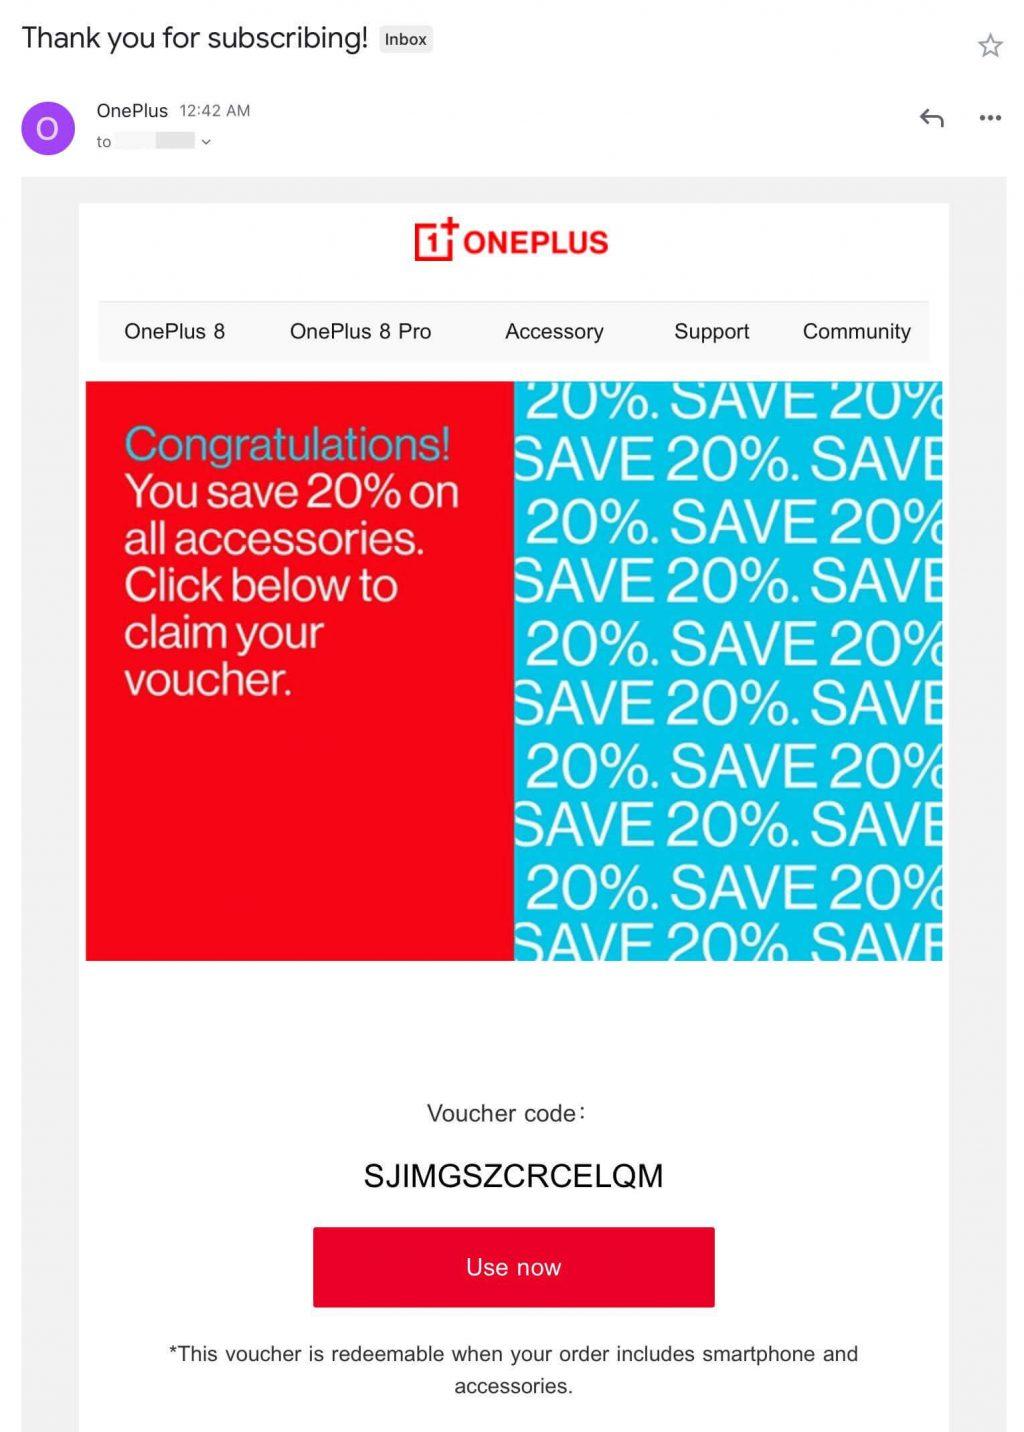 oneplus coupon code